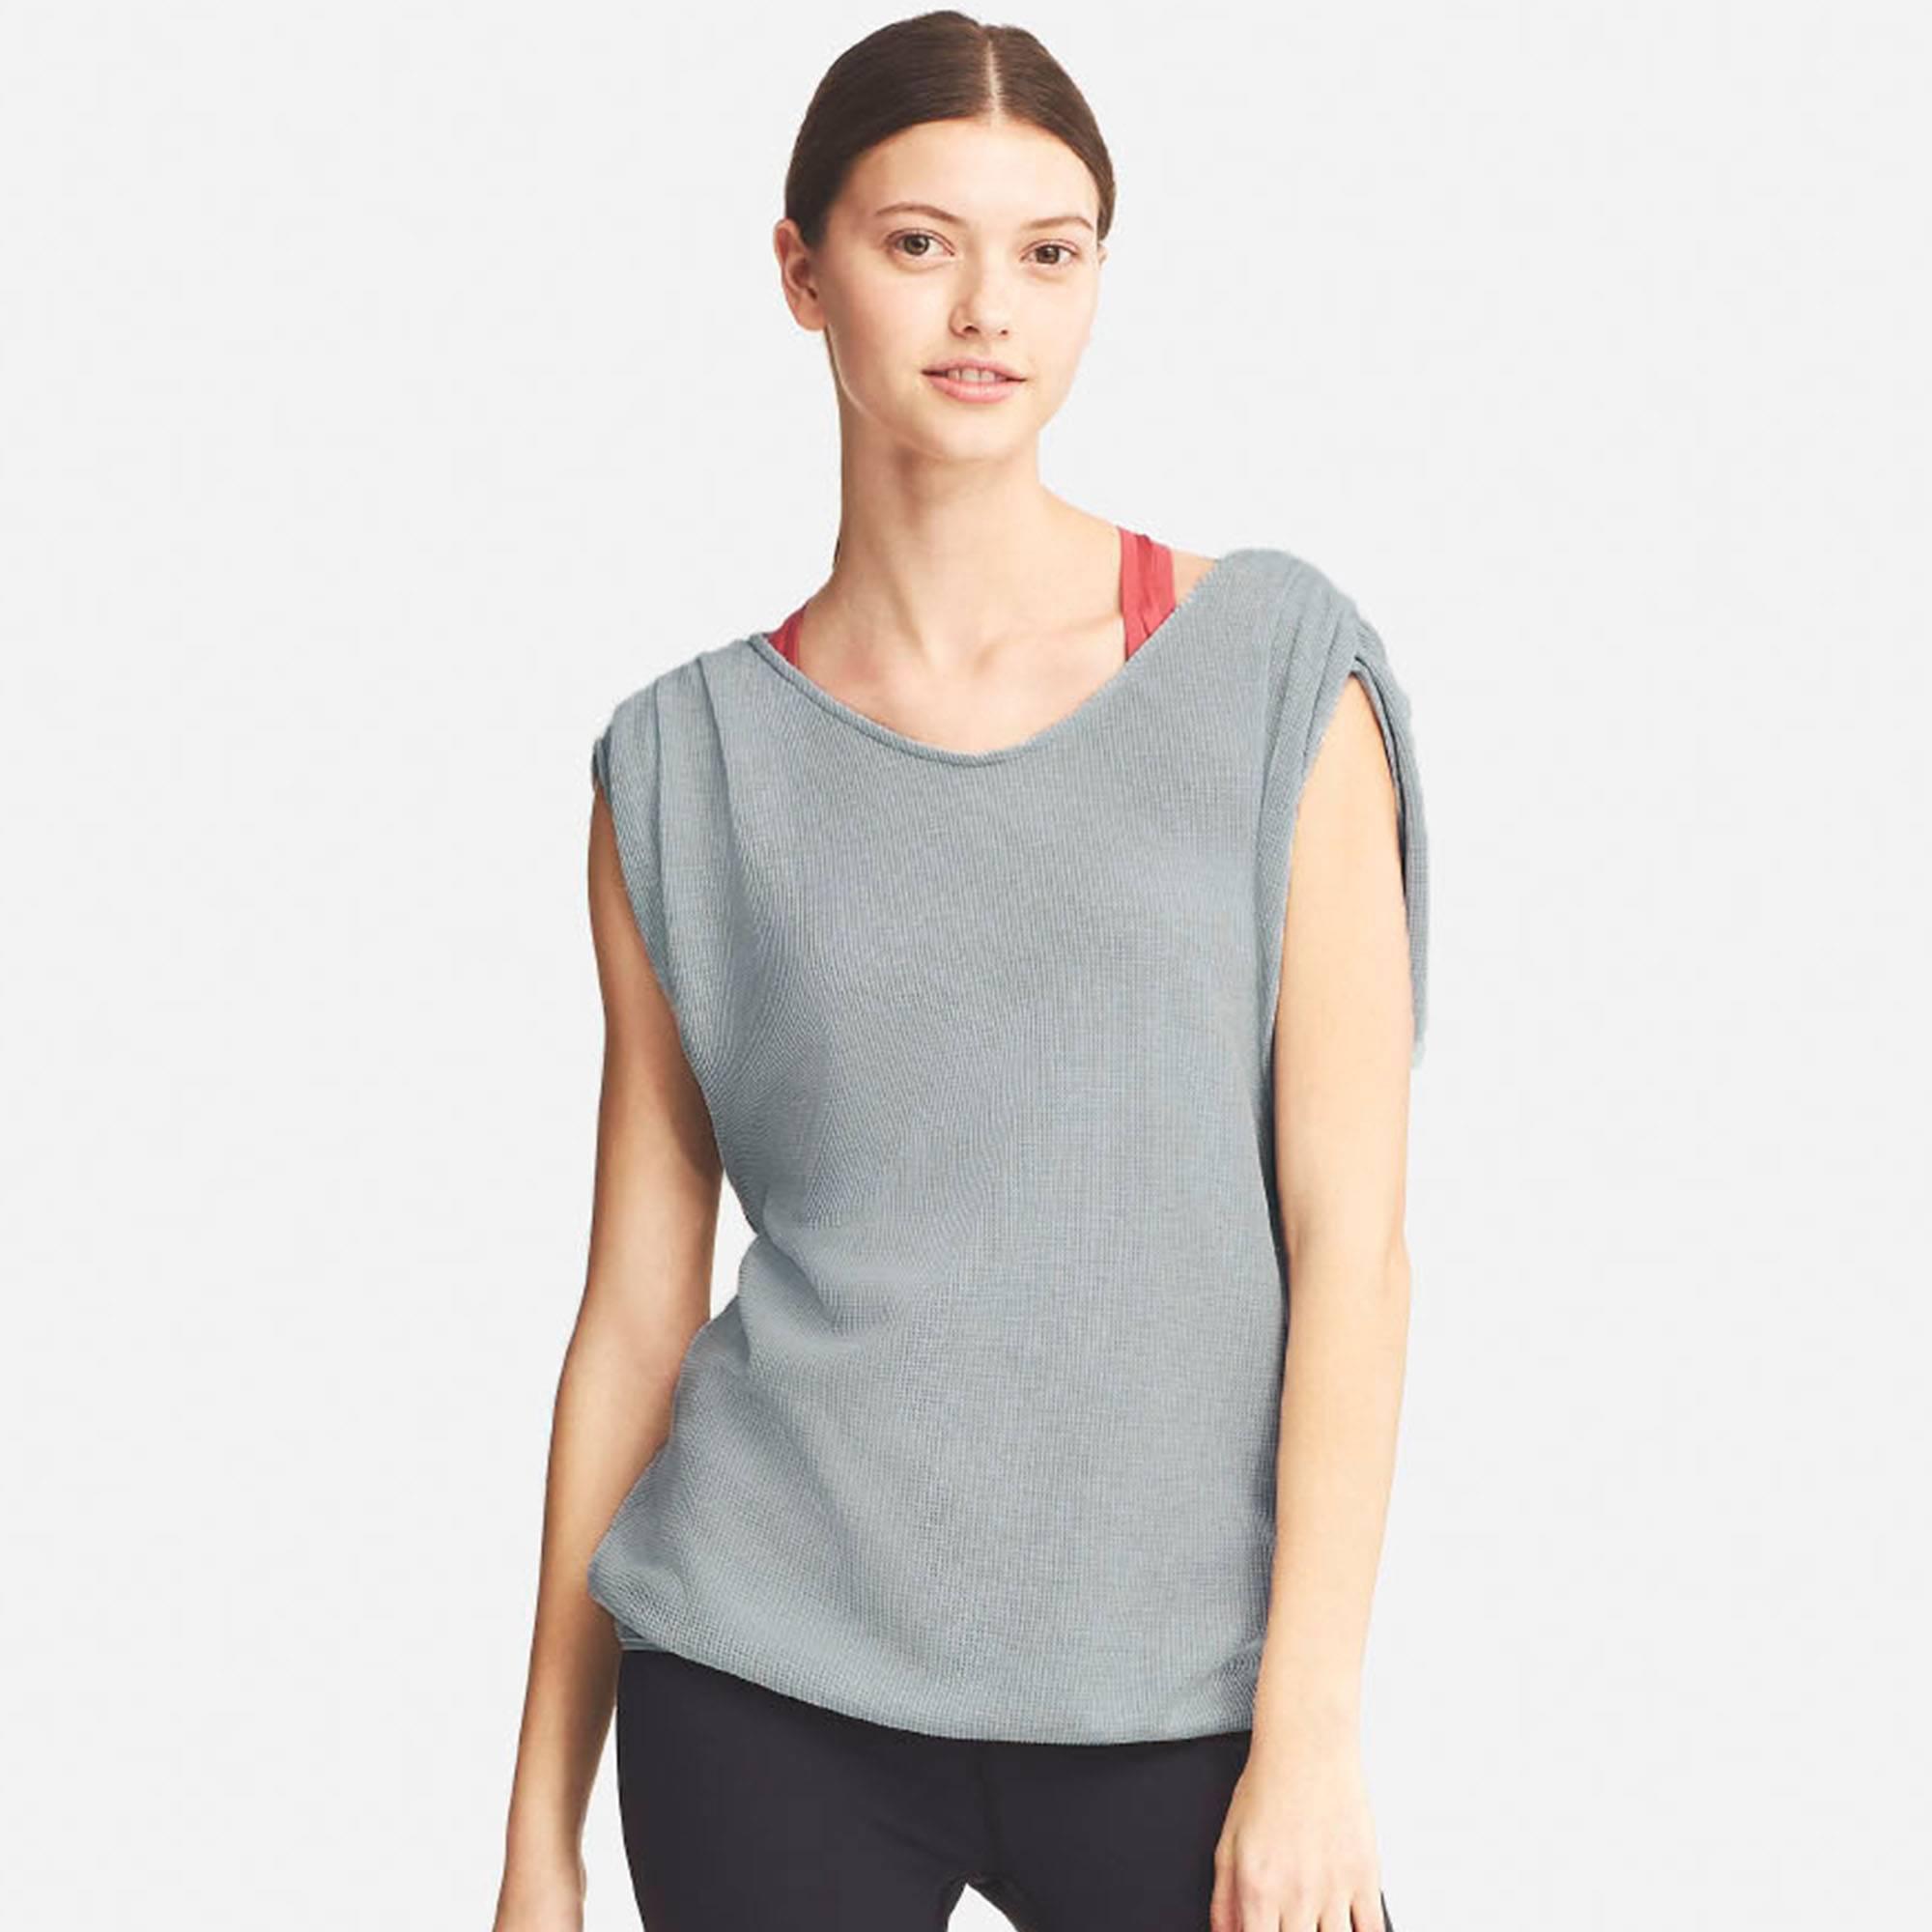 ee869c33eb3ef Lyst - Uniqlo Dry Waffle Short Sleeve Tunic in Gray